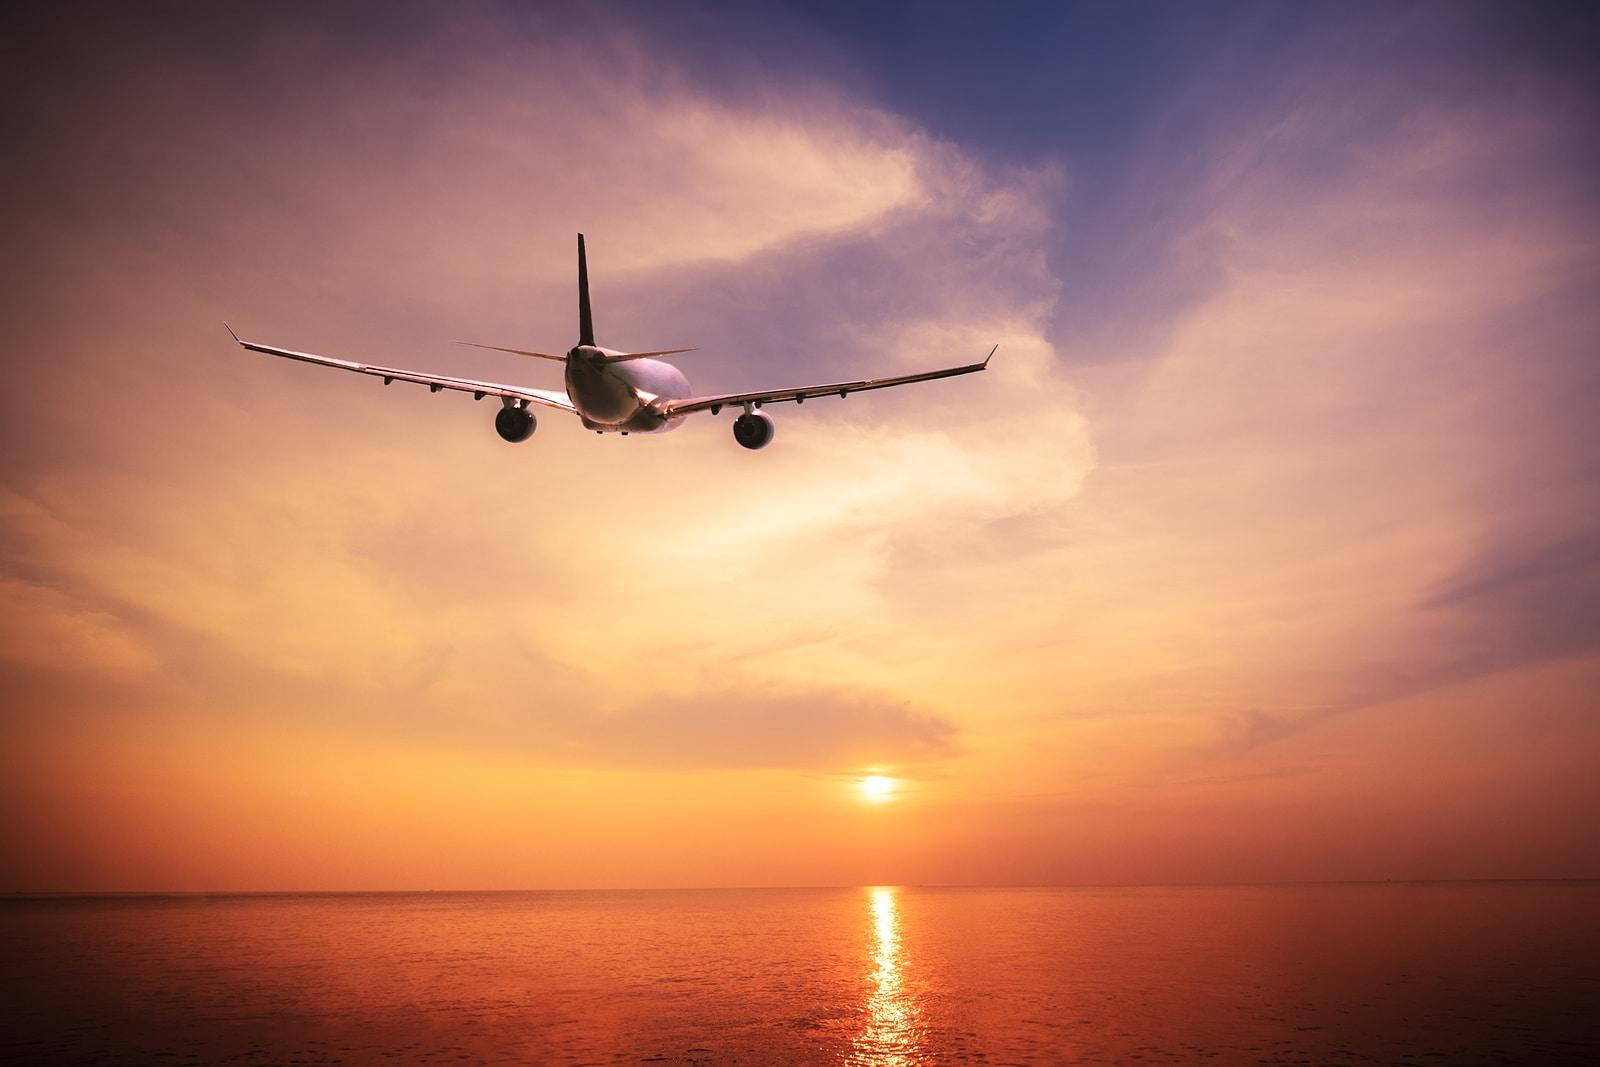 vuelos a cancún desde estados unidos